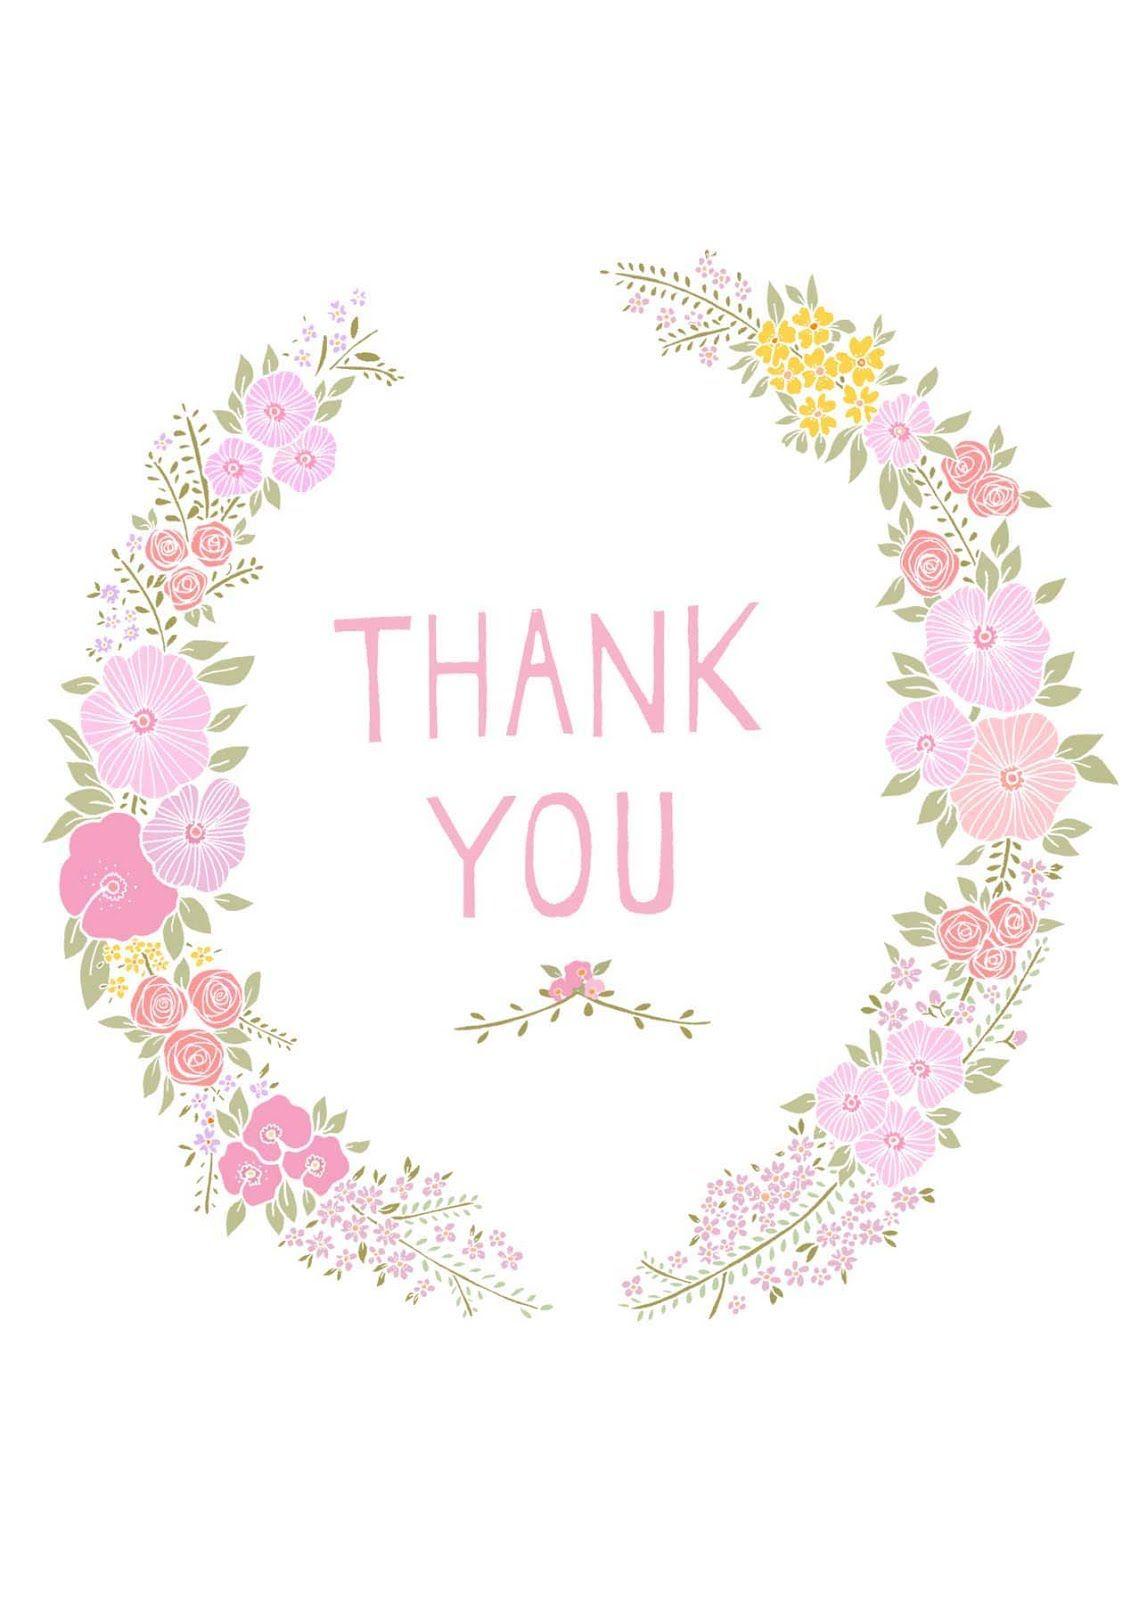 Thankyou card http://charlottelove.bigcartel.com/Charlotte love